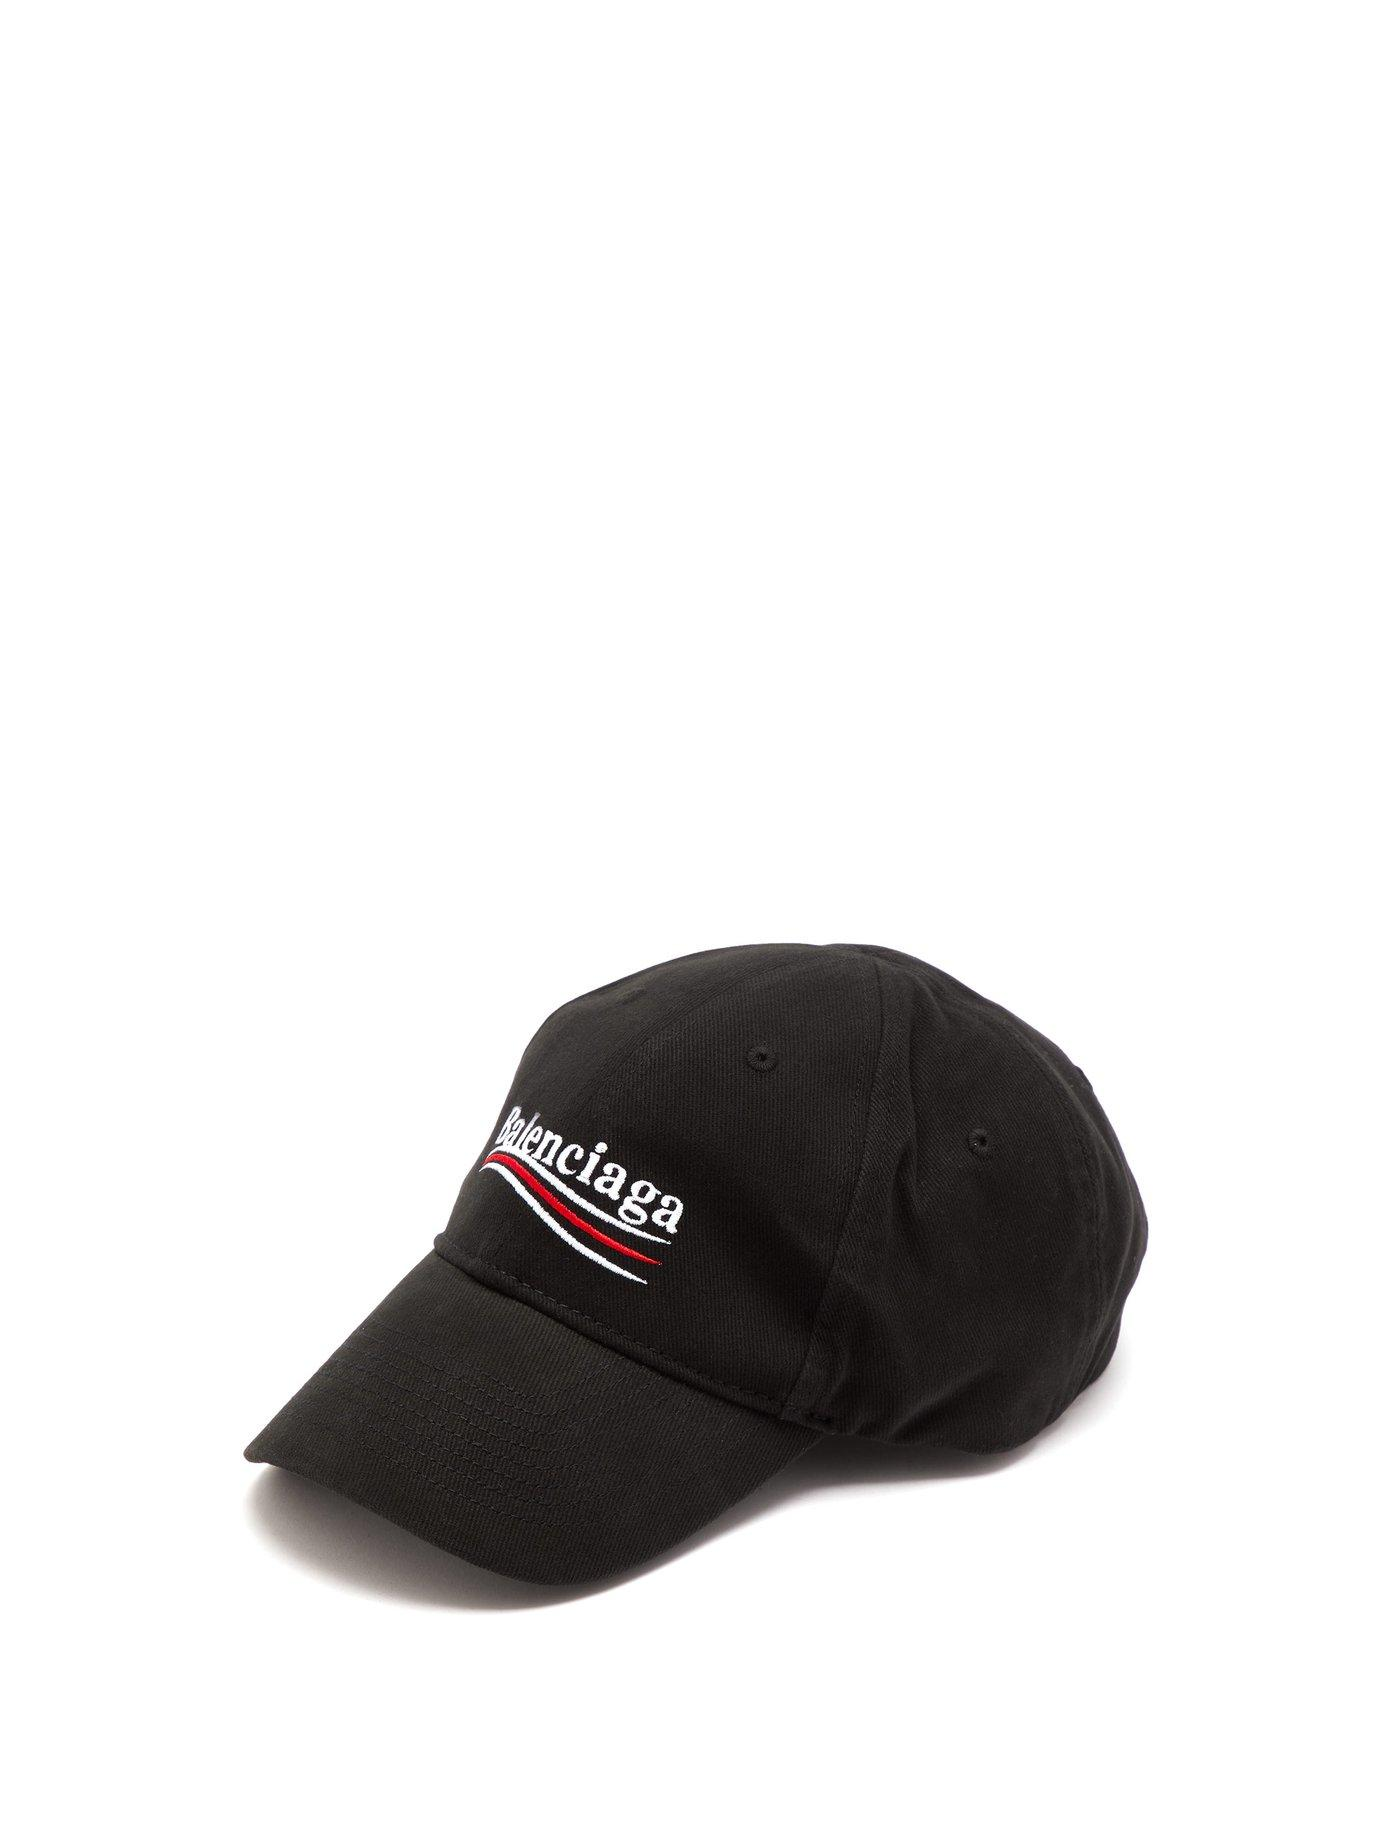 6f9d4ff3070e5 Lyst - Balenciaga Logo Embroidered Cotton Cap in Black